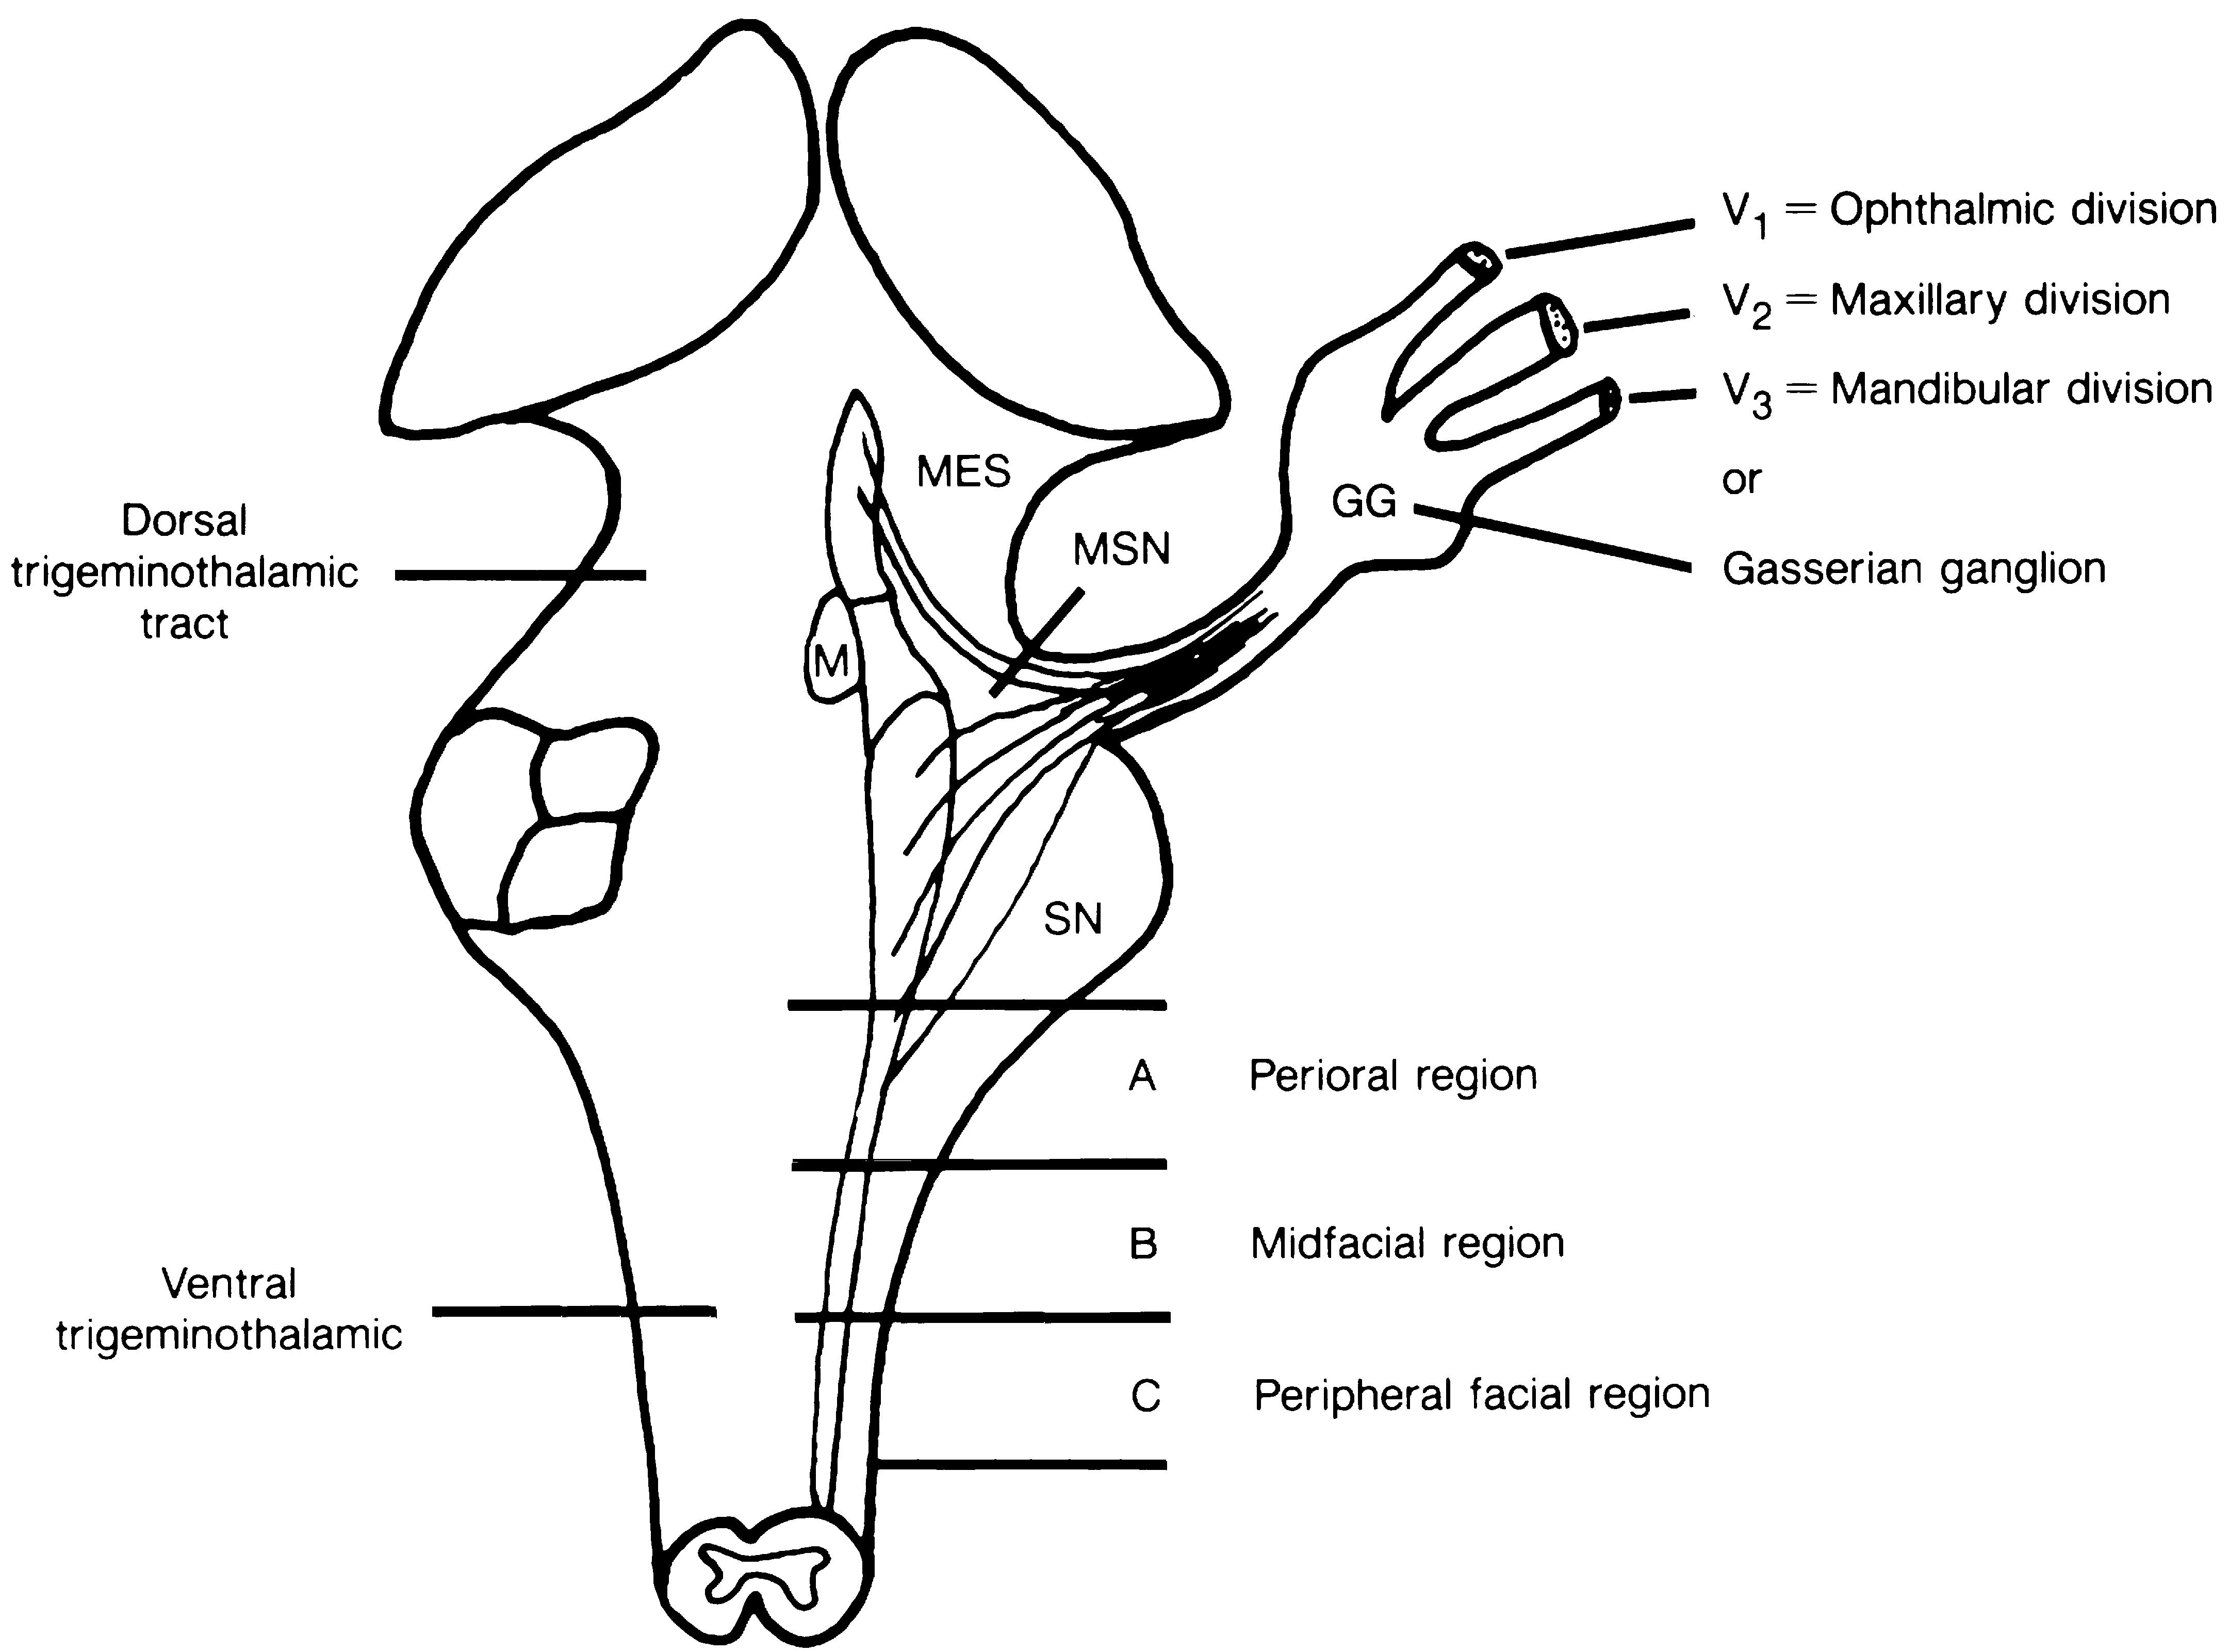 Cranial nerve V complex (dorsal view of brain stem